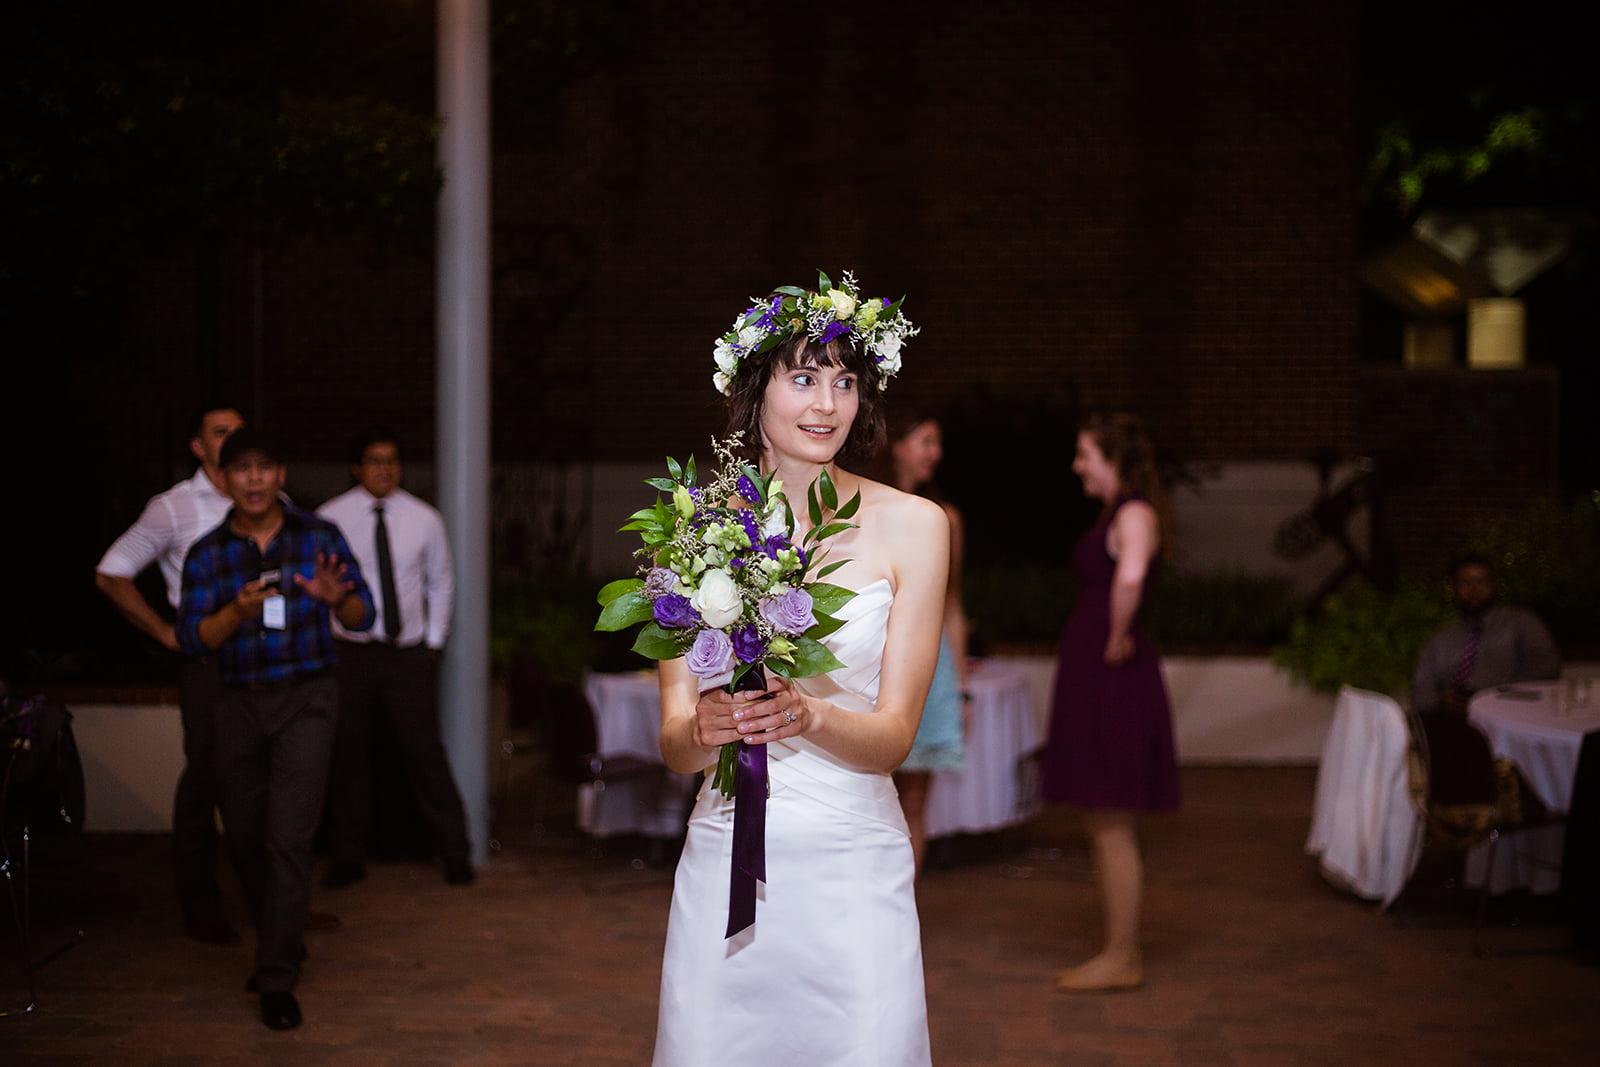 Blacano Wedding - Reception-89.jpg